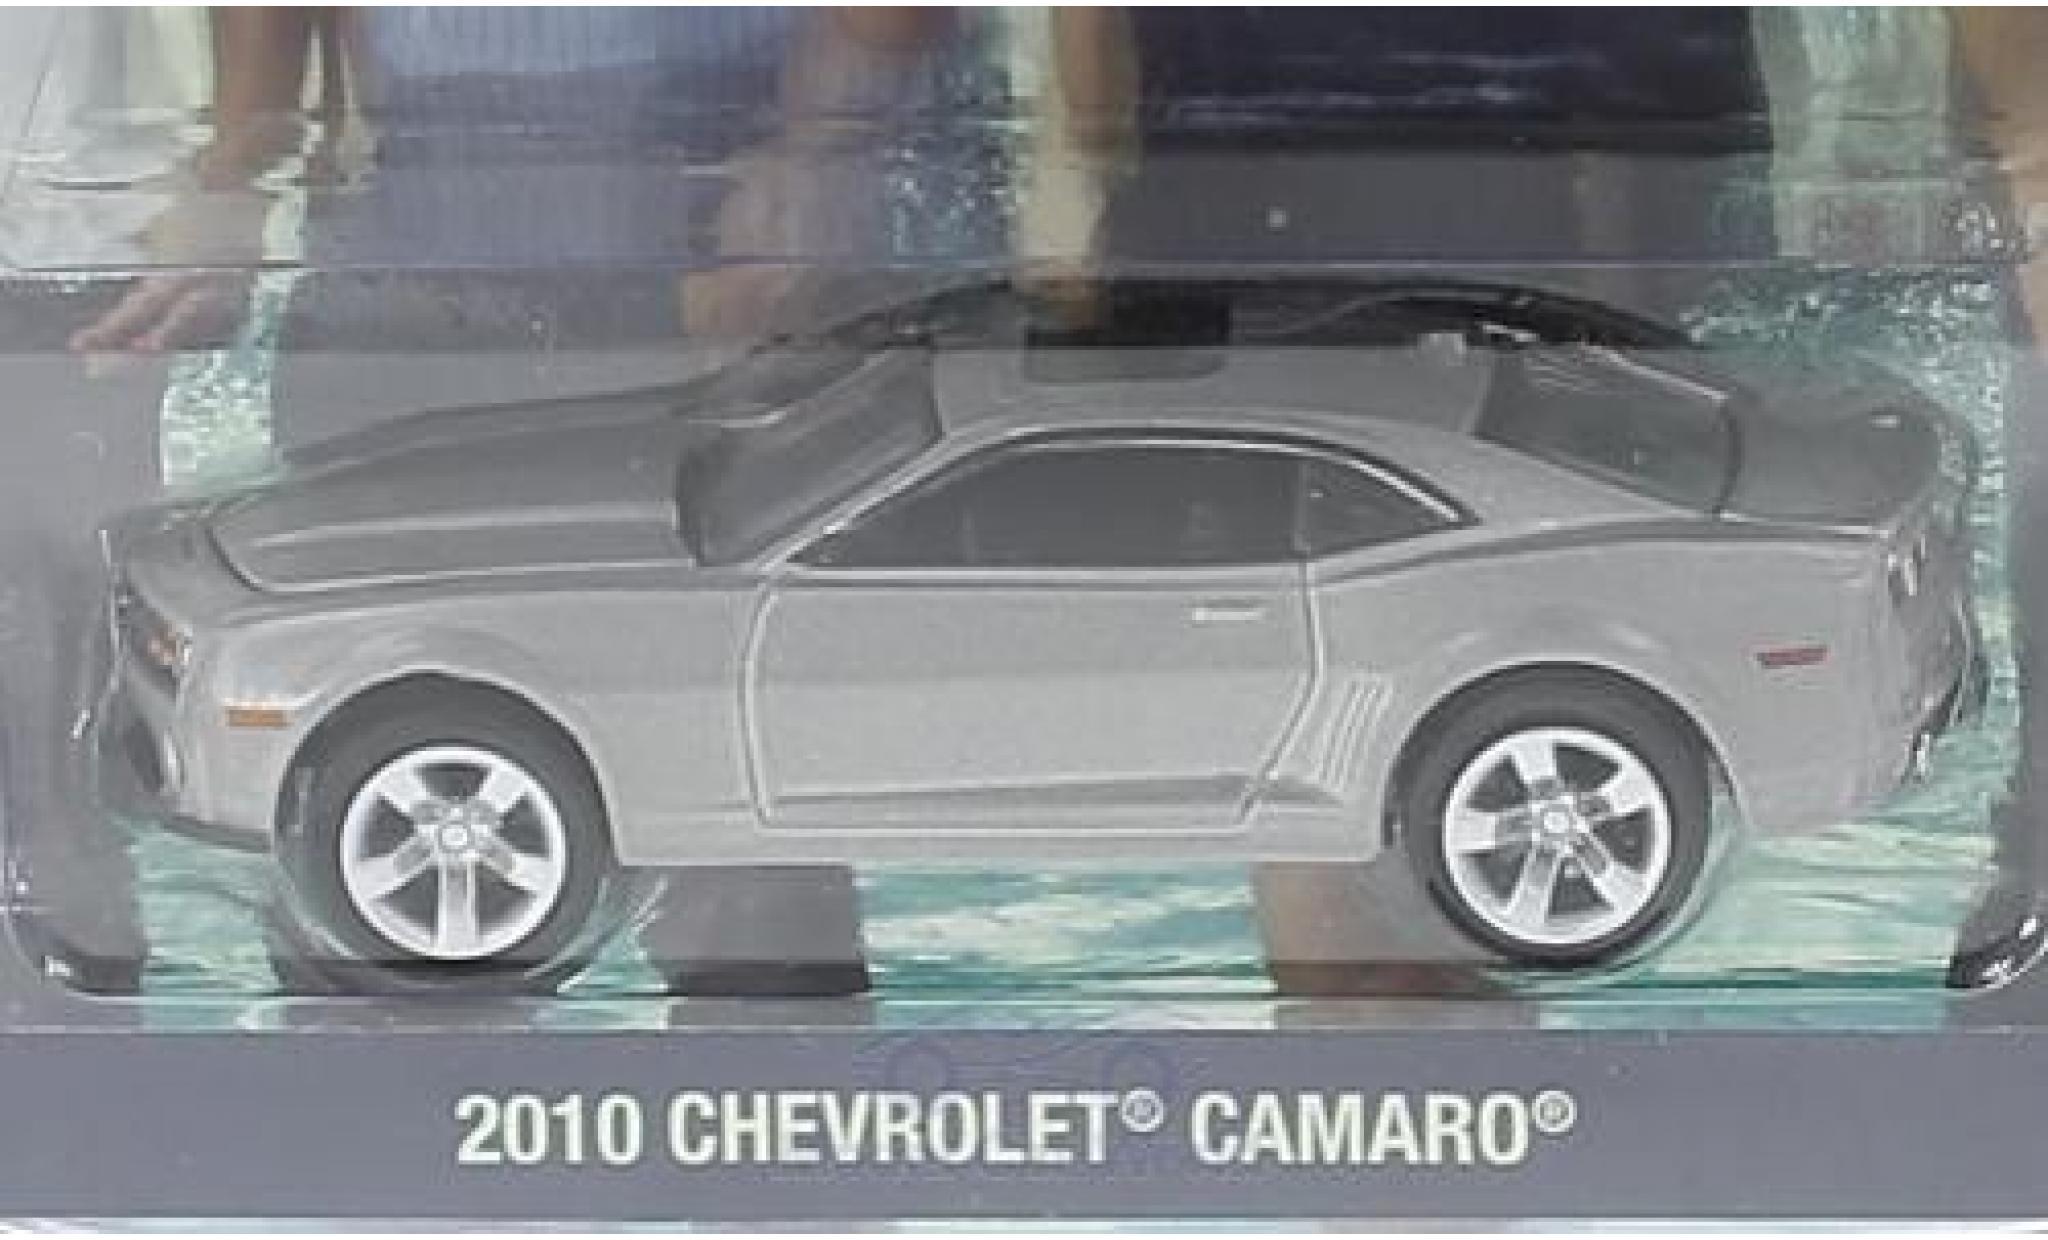 Chevrolet Camaro 1/64 Greenlight metallic-grise Hawaii Five-0 2010